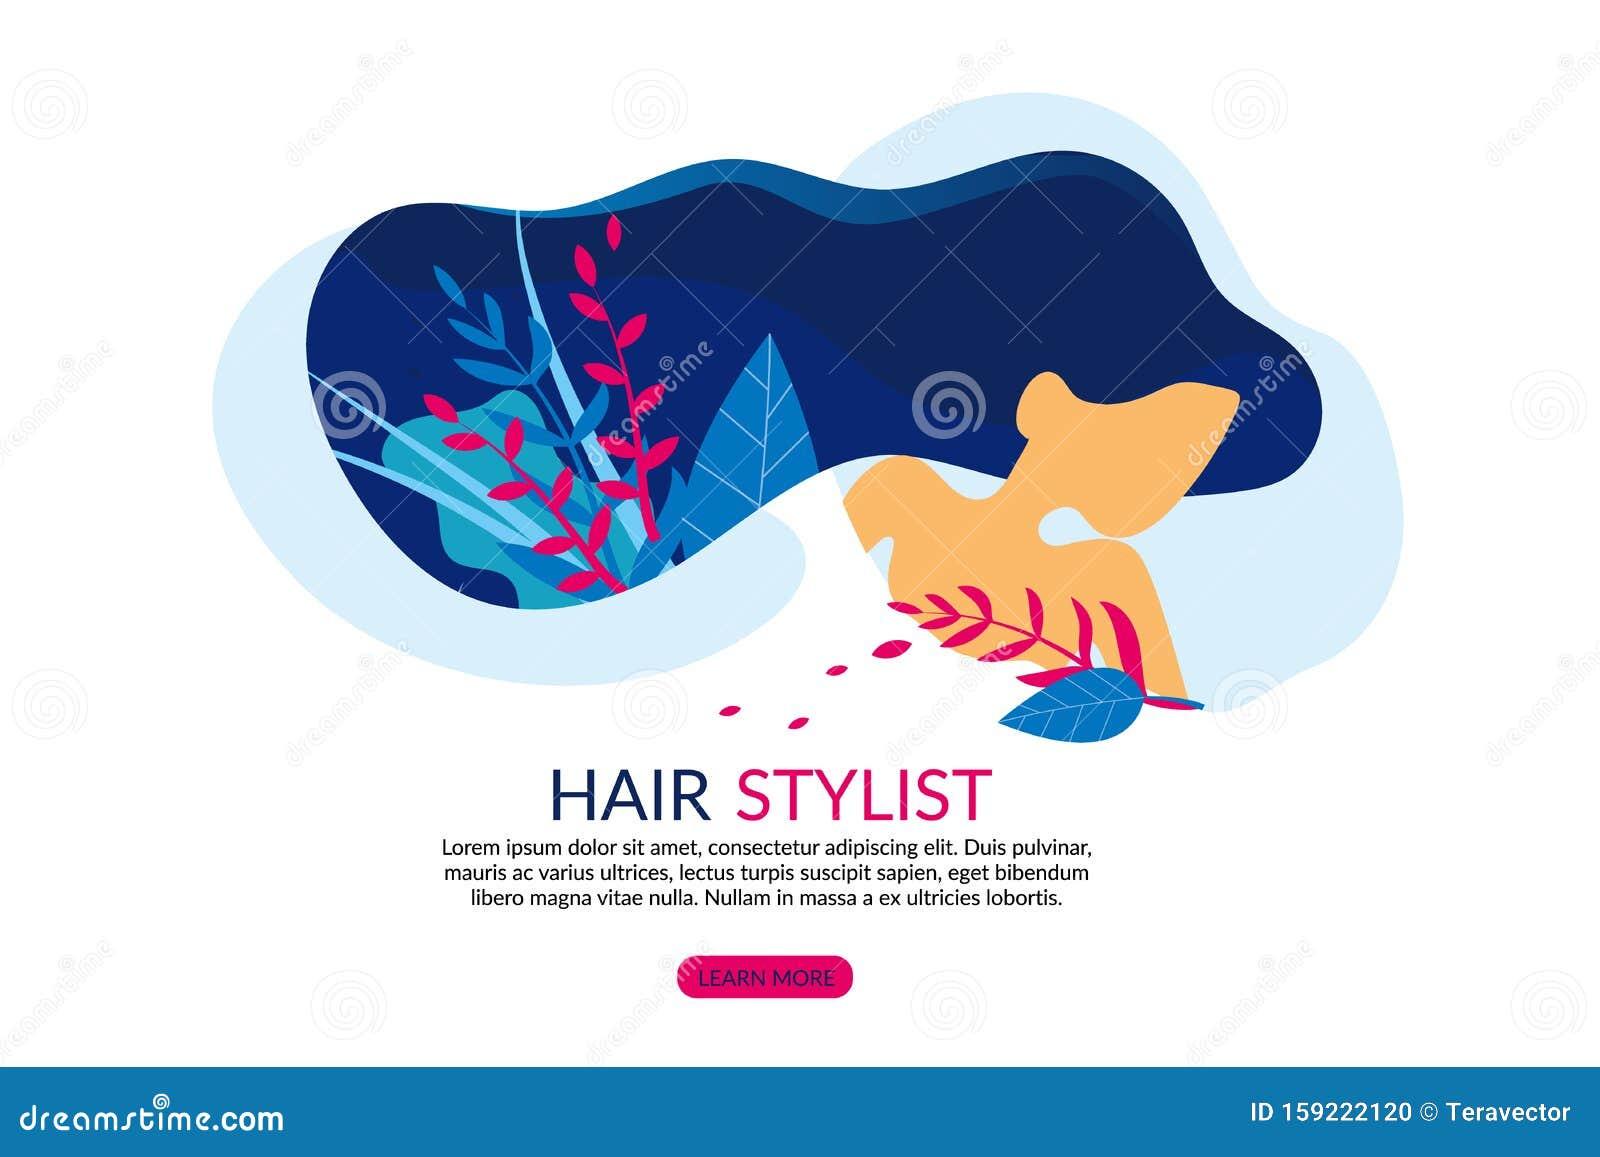 Hair Salon Ad Stock Illustrations 17 Hair Salon Ad Stock Illustrations Vectors Clipart Dreamstime